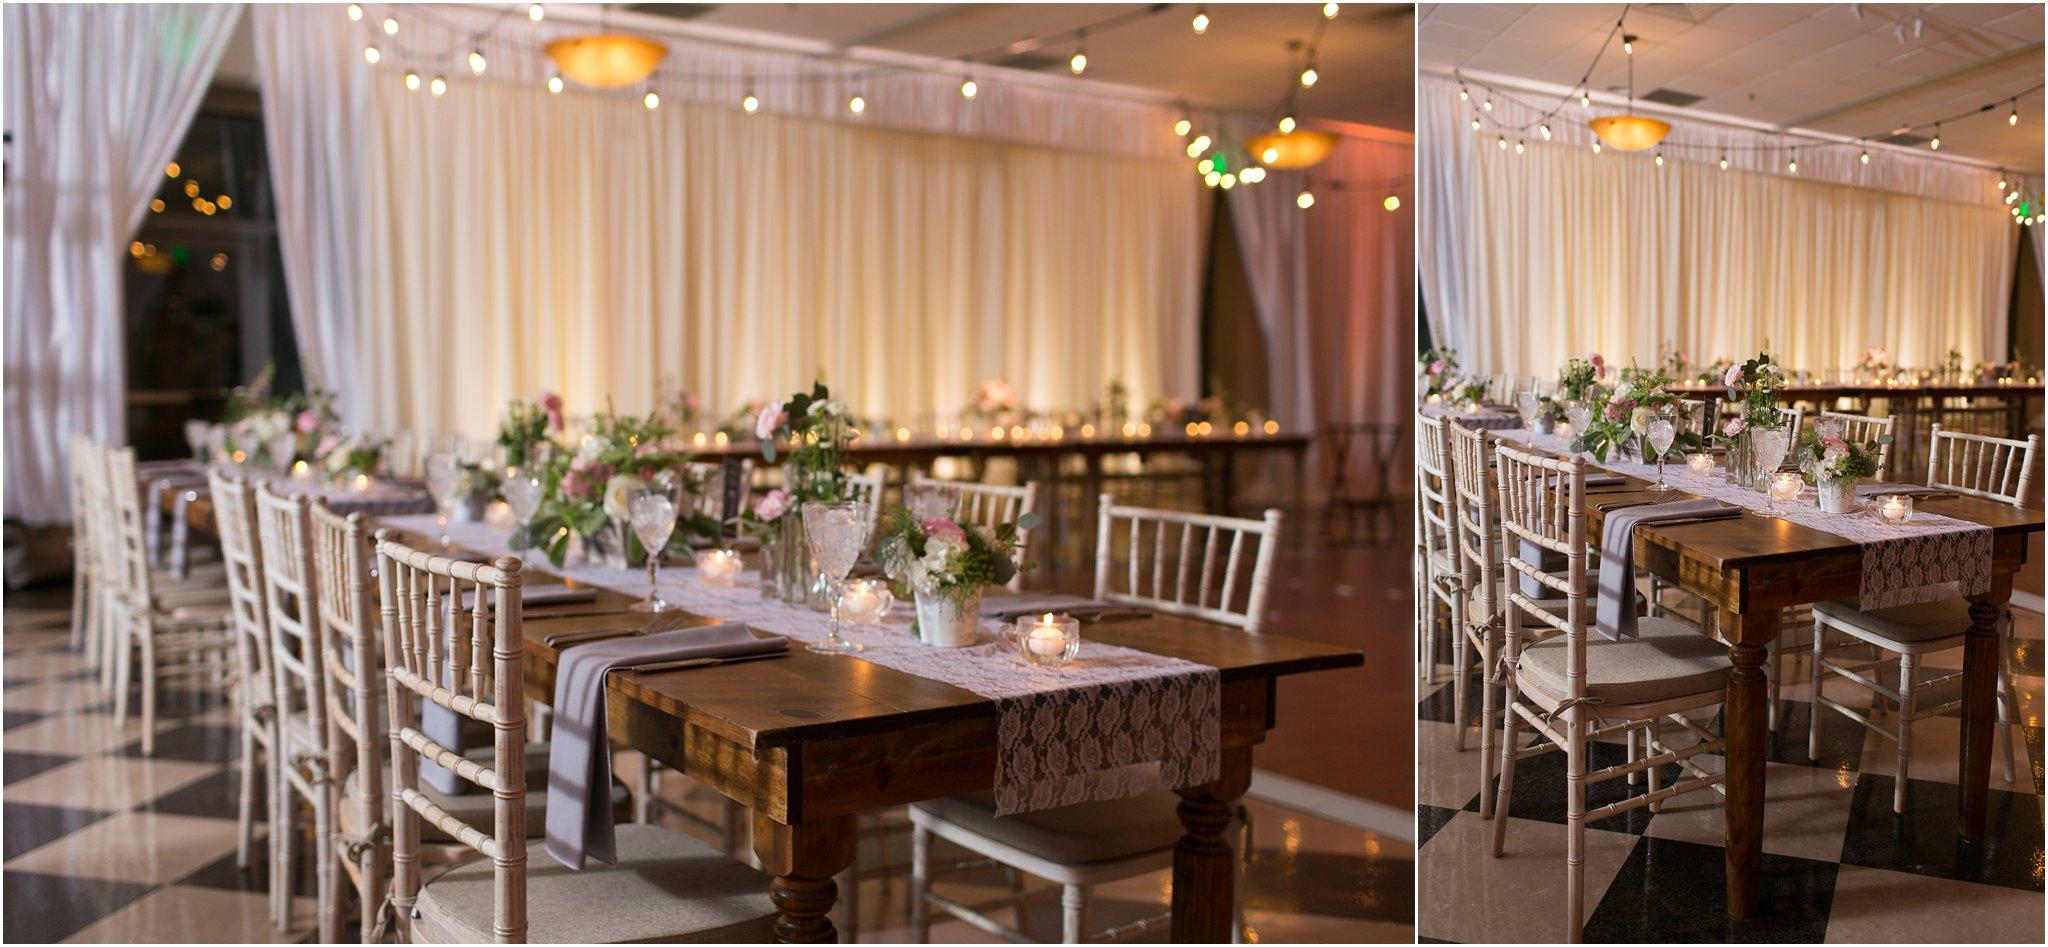 jessica_ryan_photography_virginia_wedding_photographer_wedding_hurricane_norfolk_botanical_gardens_hurricane_matthew_wedding_3625